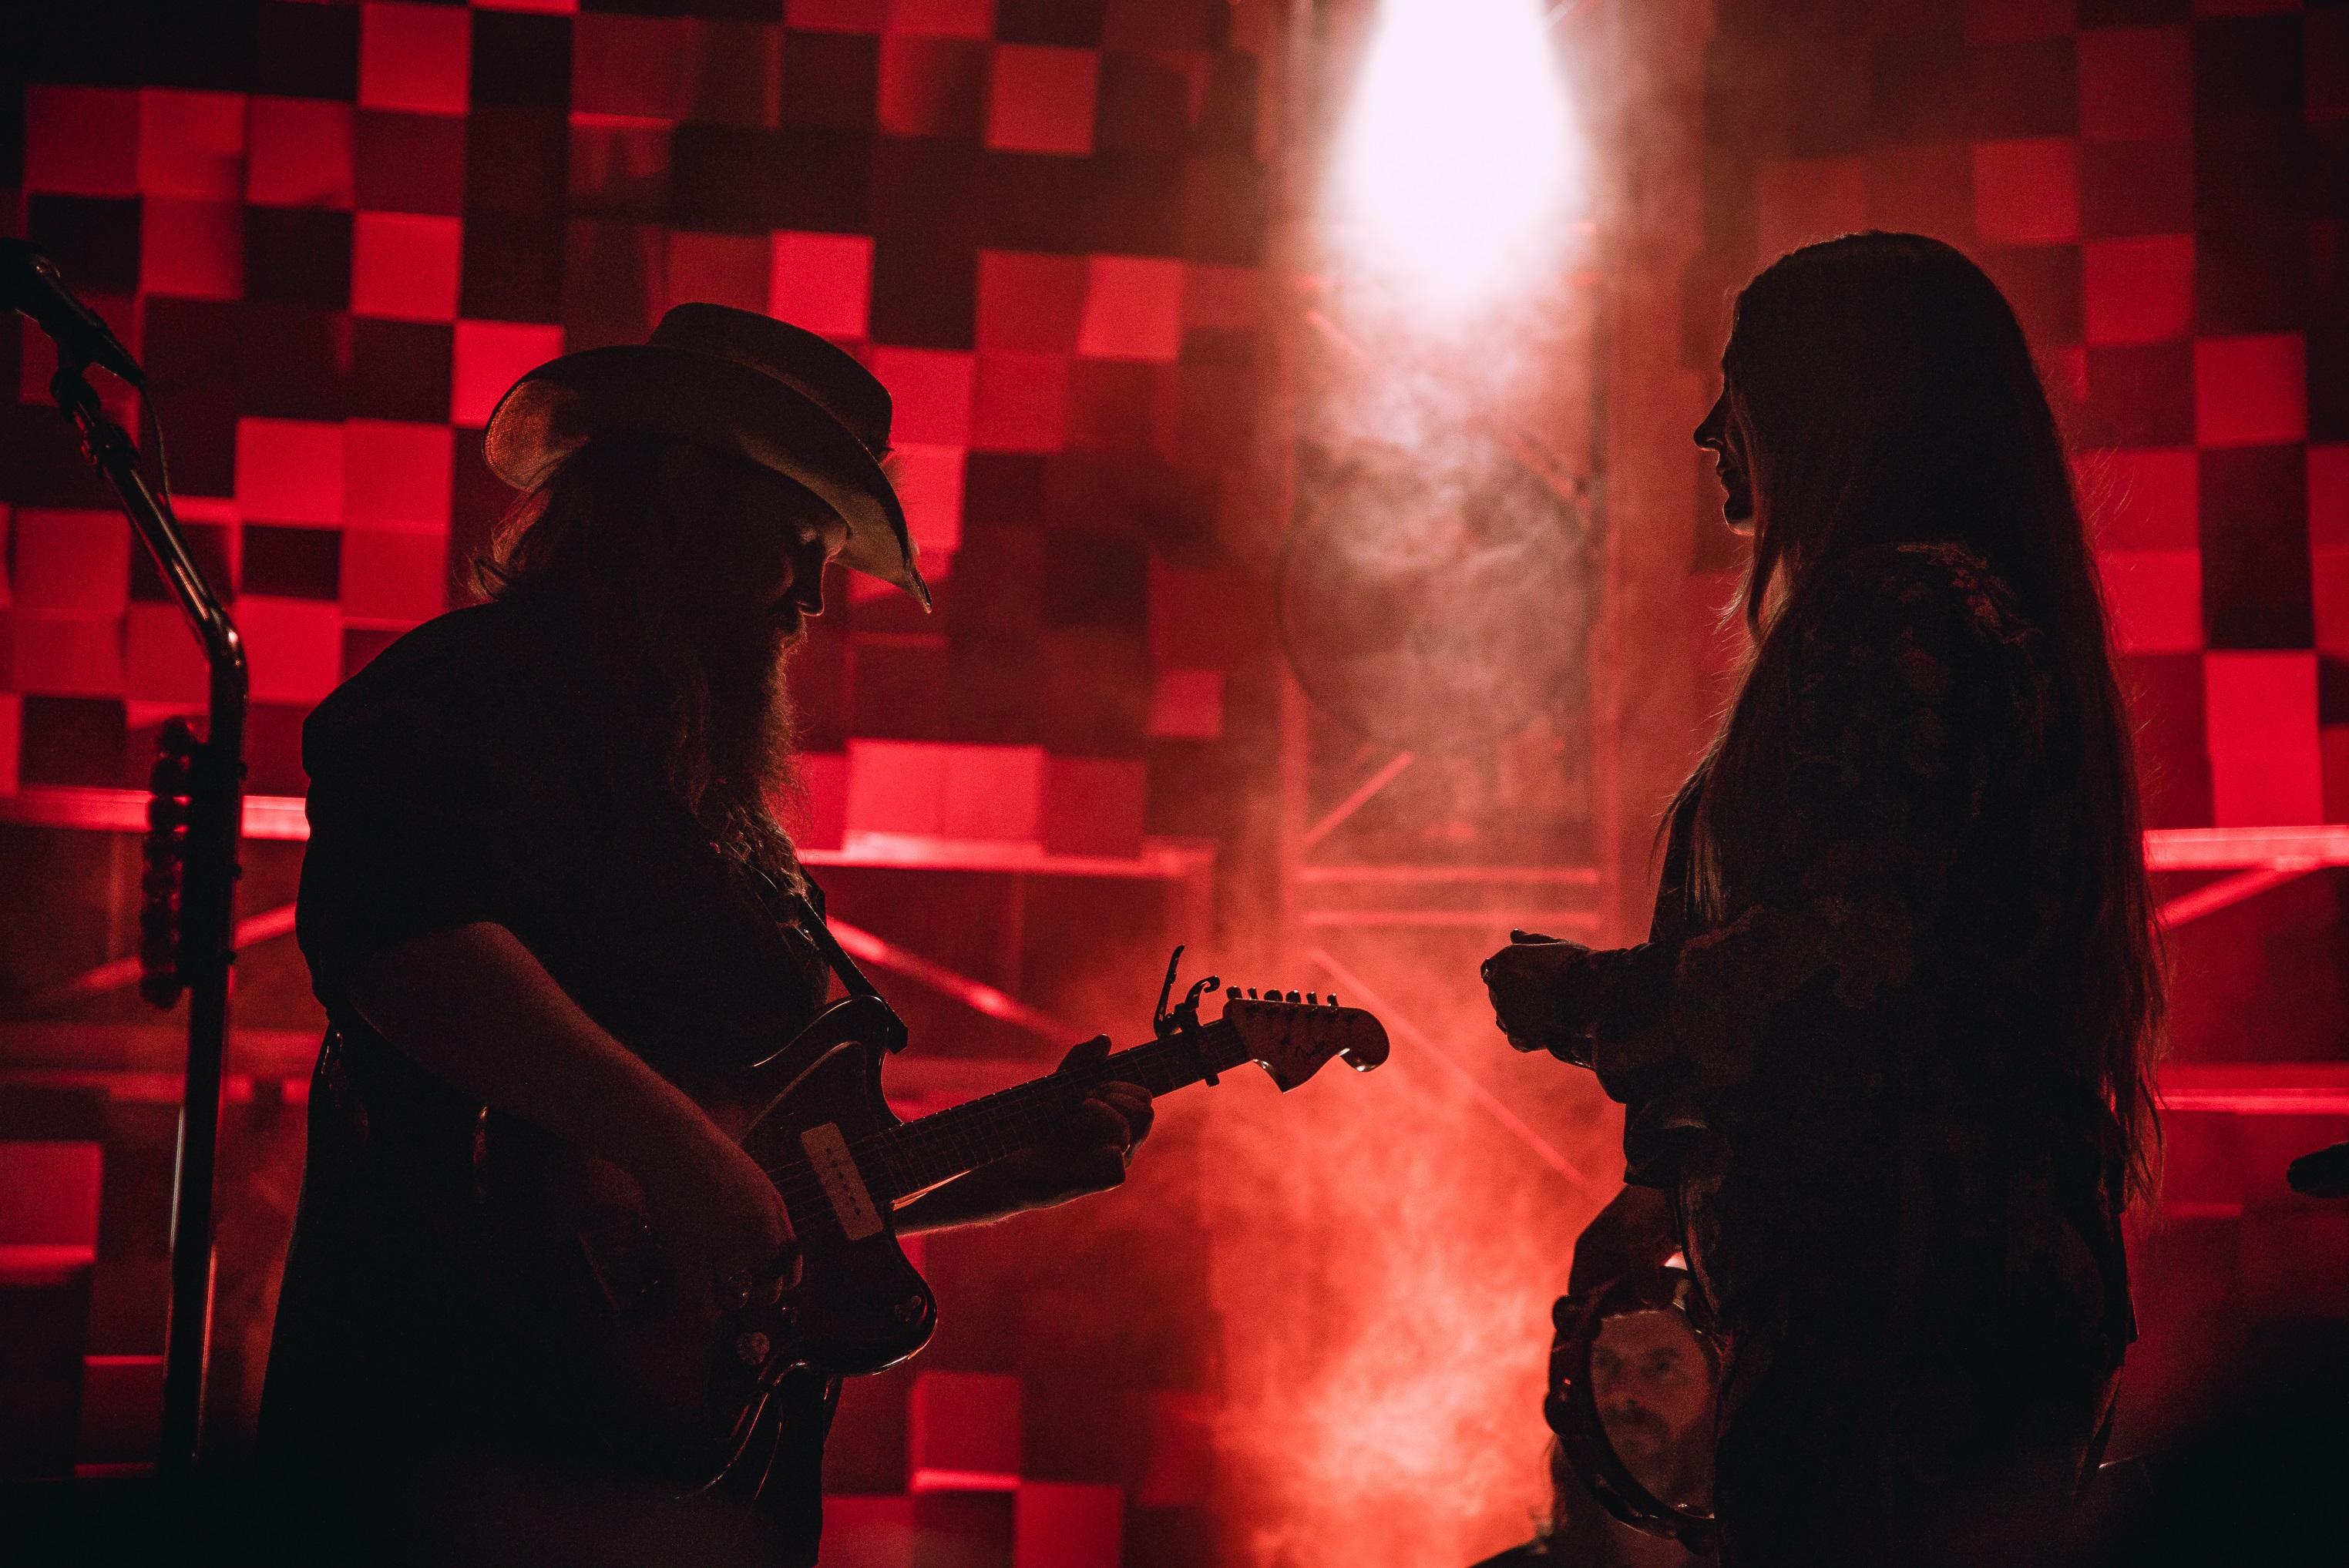 Chris & Morgane Stapleton; Photo credit: Andrew Wendowski/Sounds Like Nashville